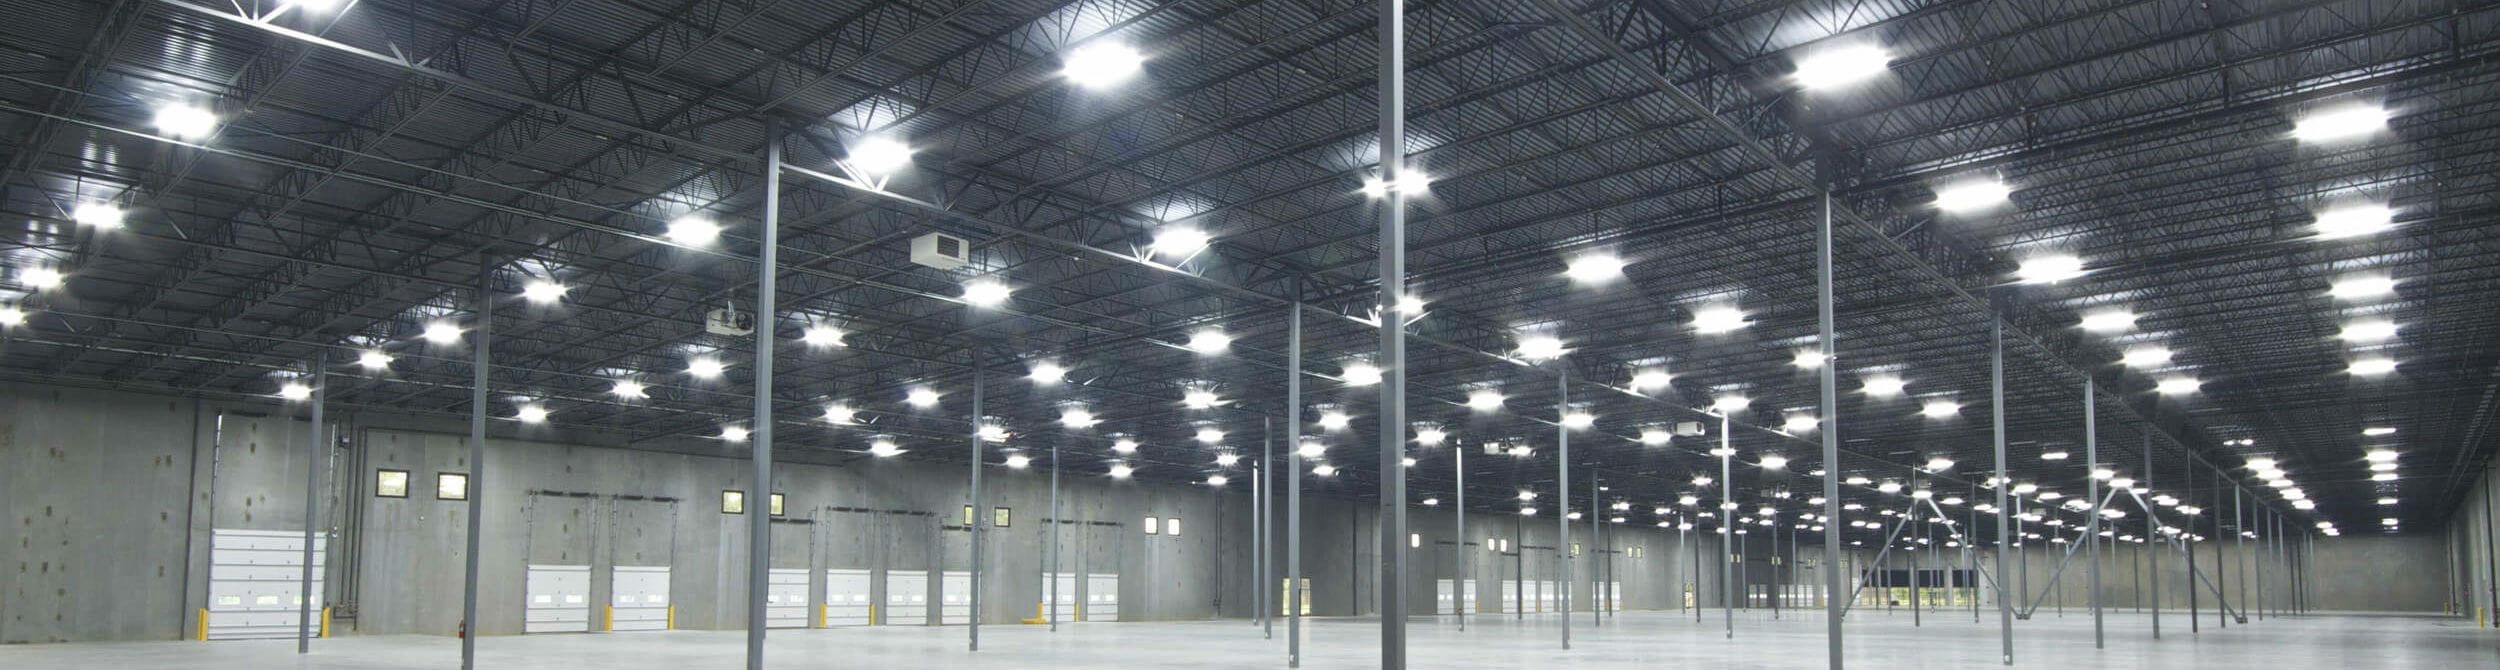 Led high bay warehouse lighting led industrial lighting nz pure led